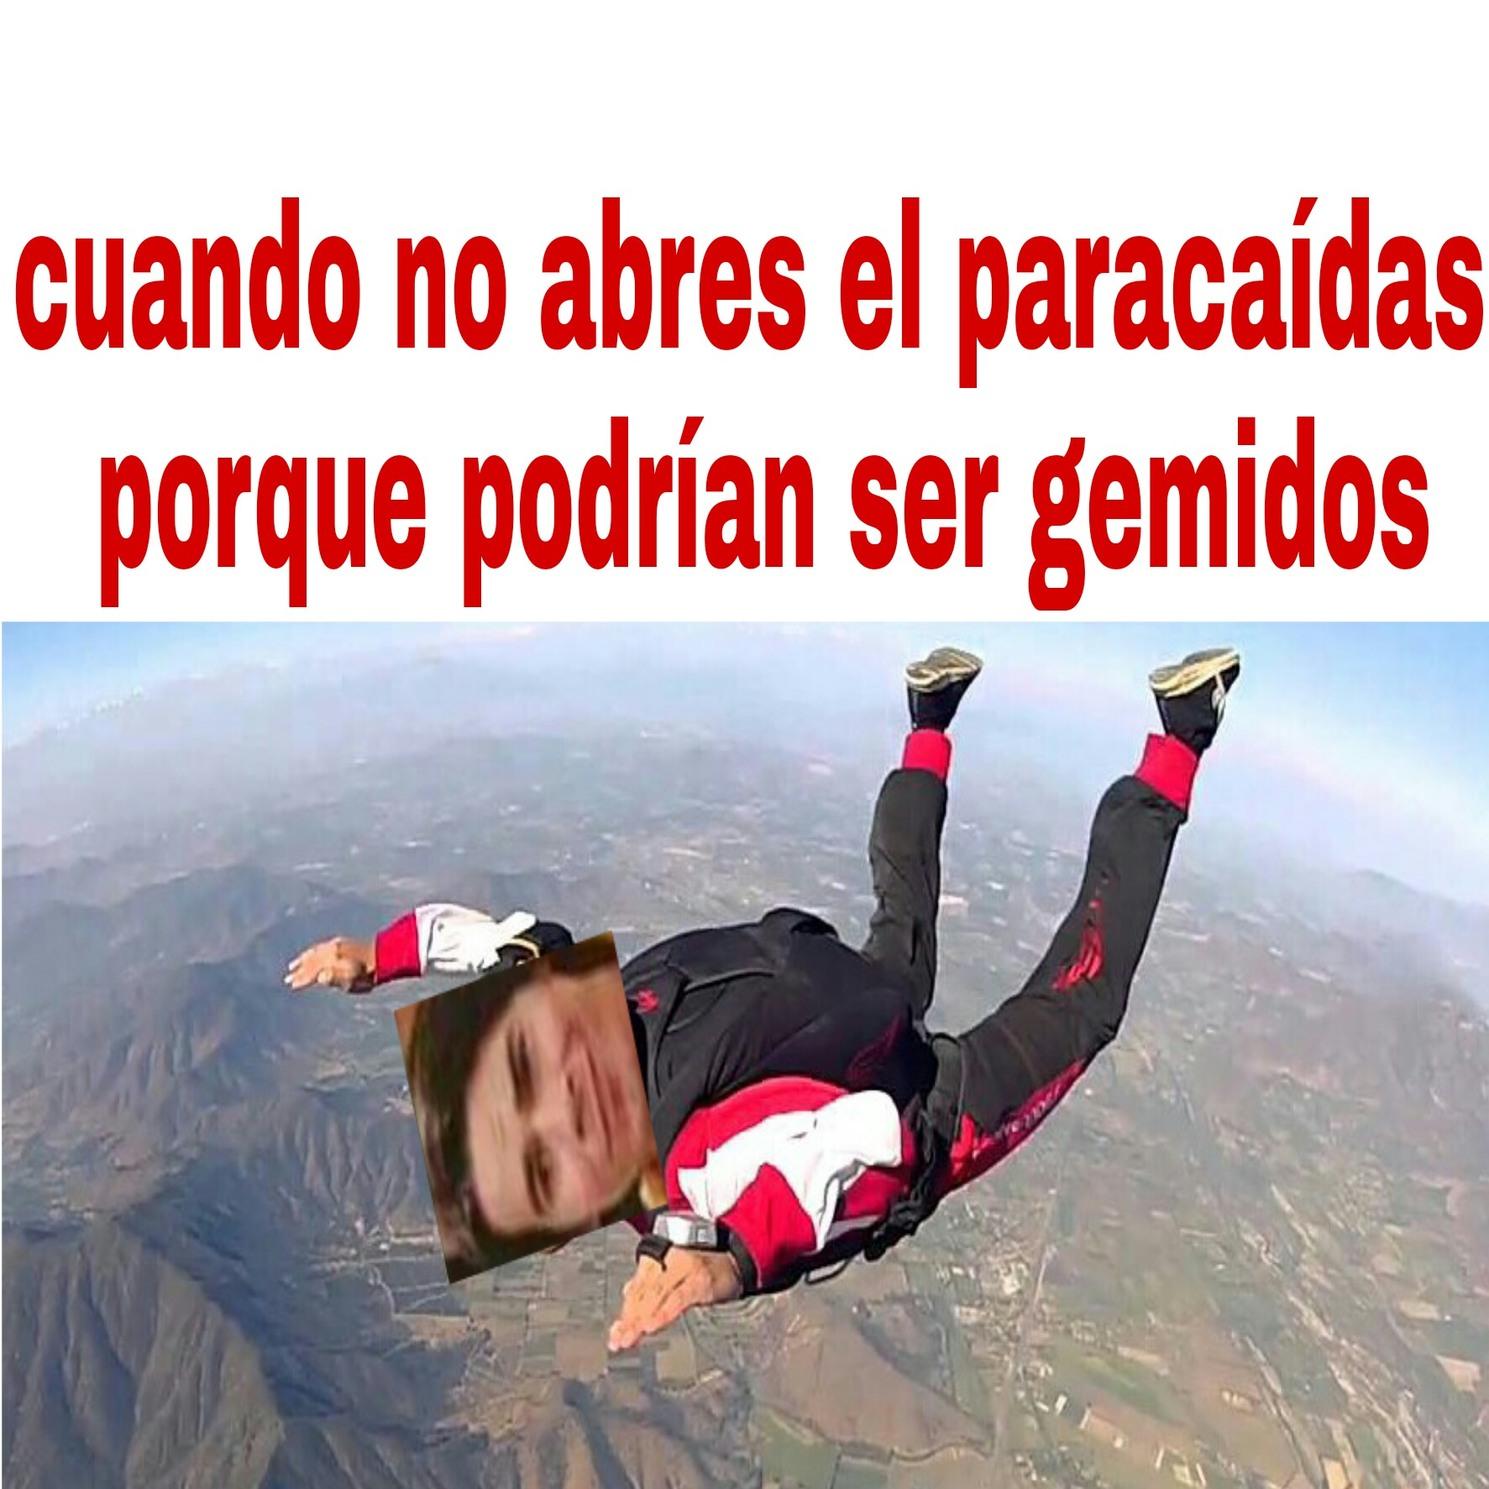 Xd - meme